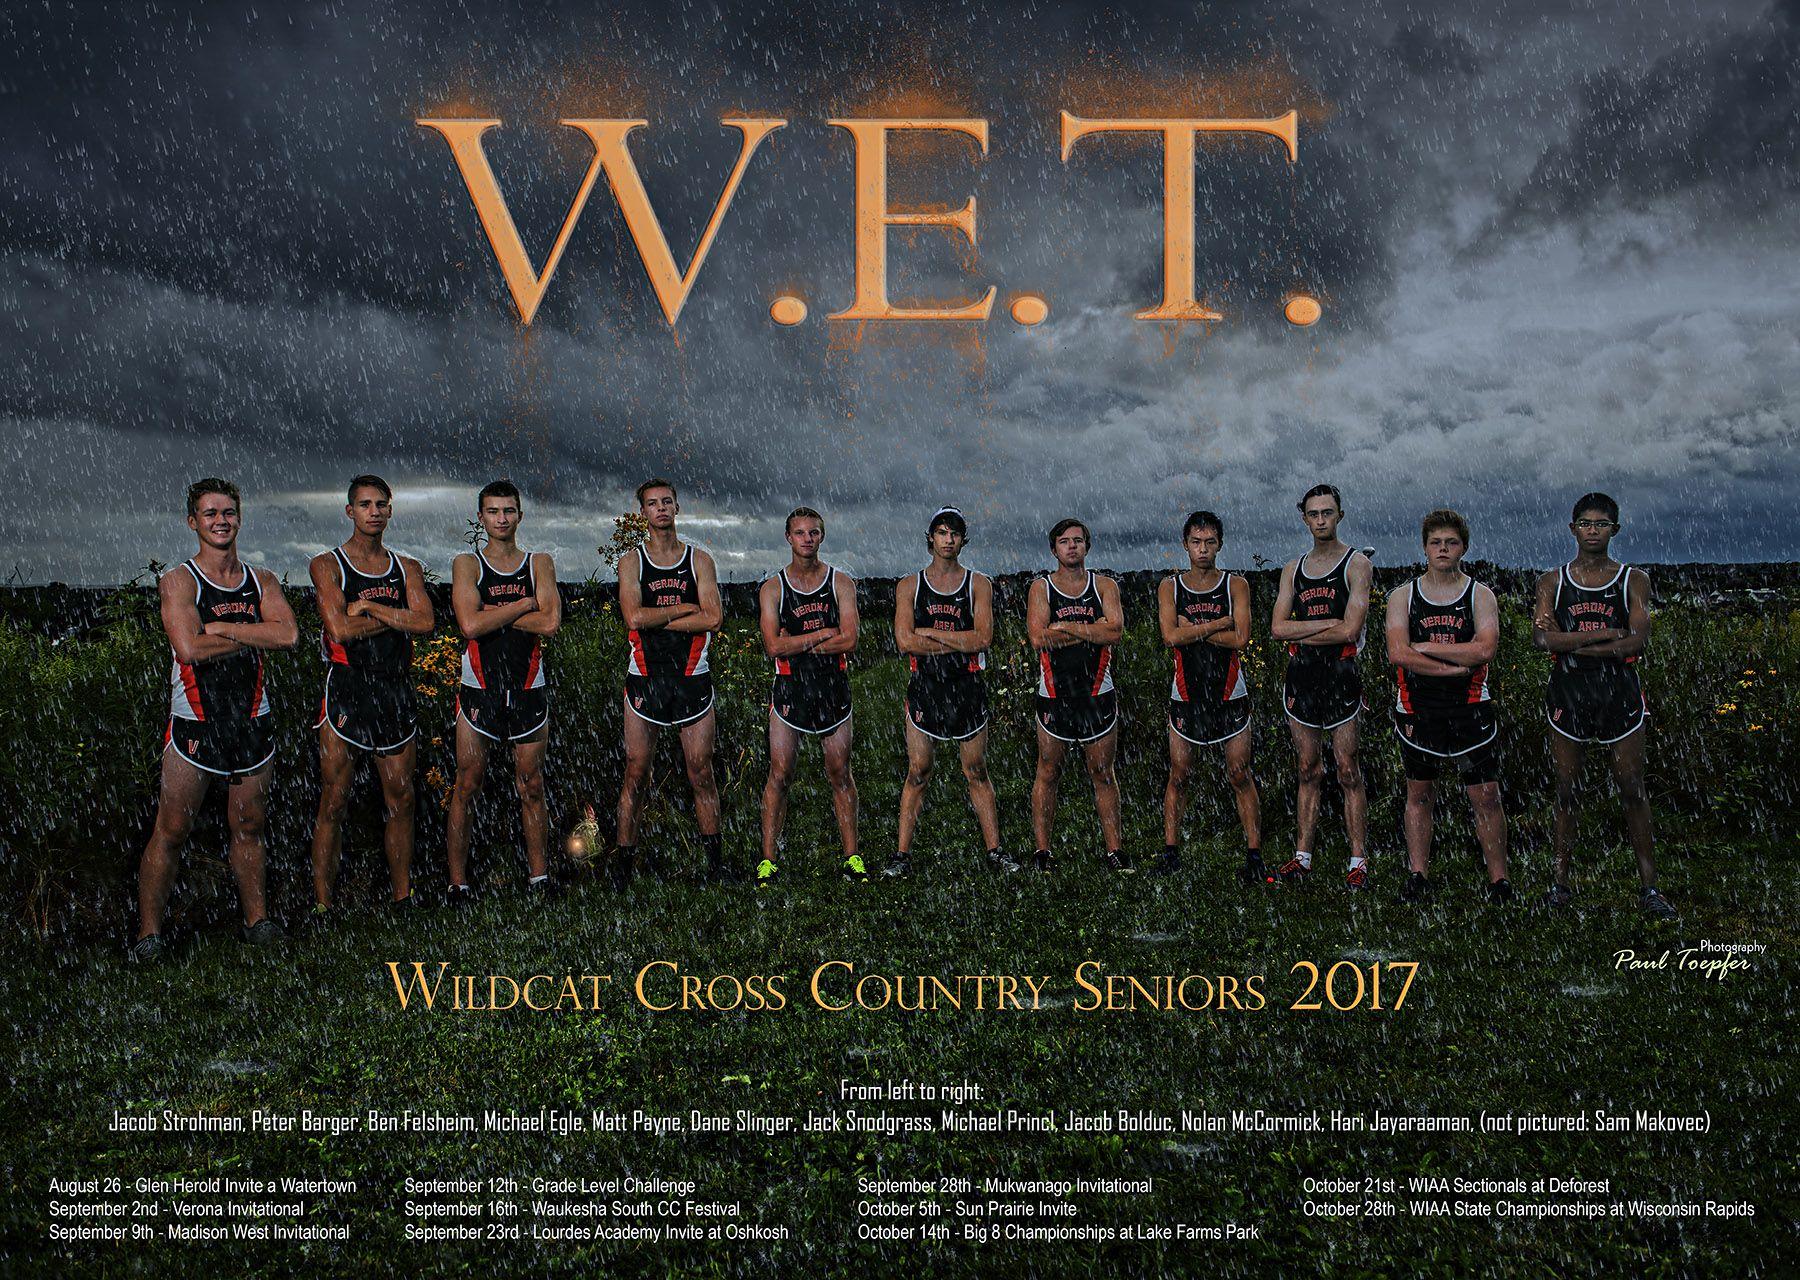 Cross Country Sport Team Poster School Sports Posters Groups Poster High School Sports Posters